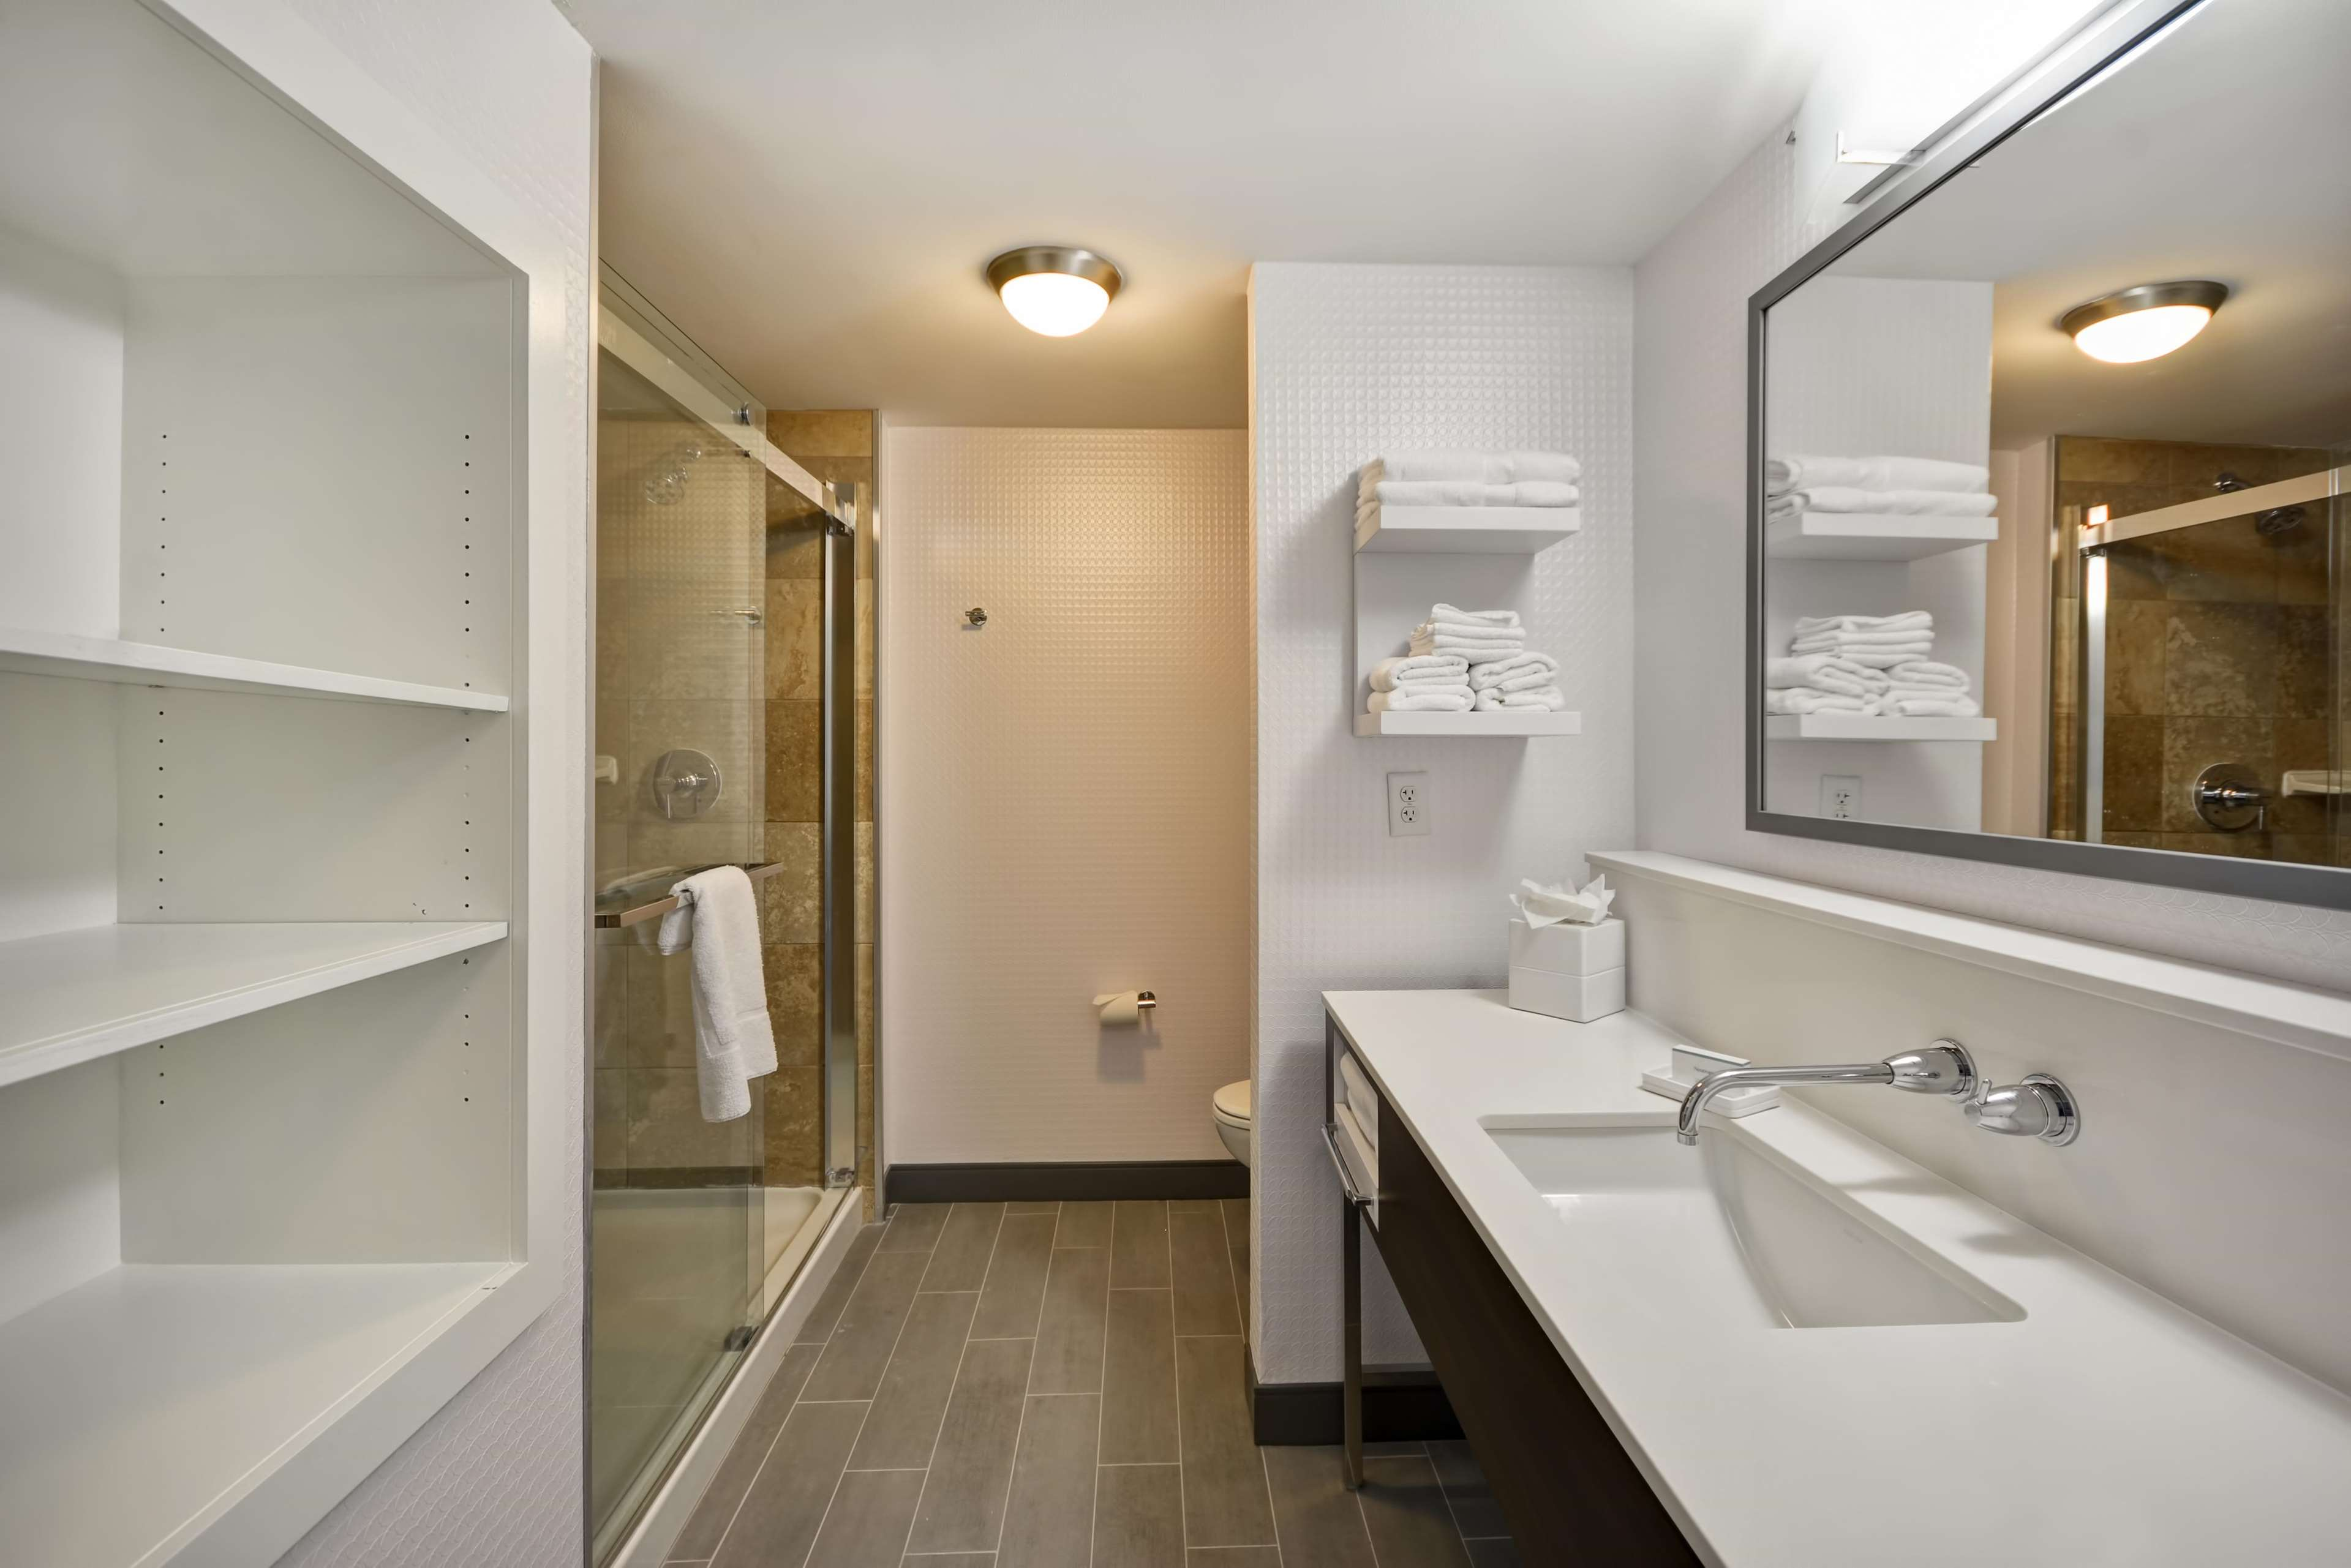 Hampton Inn & Suites Columbus-Easton Area image 54